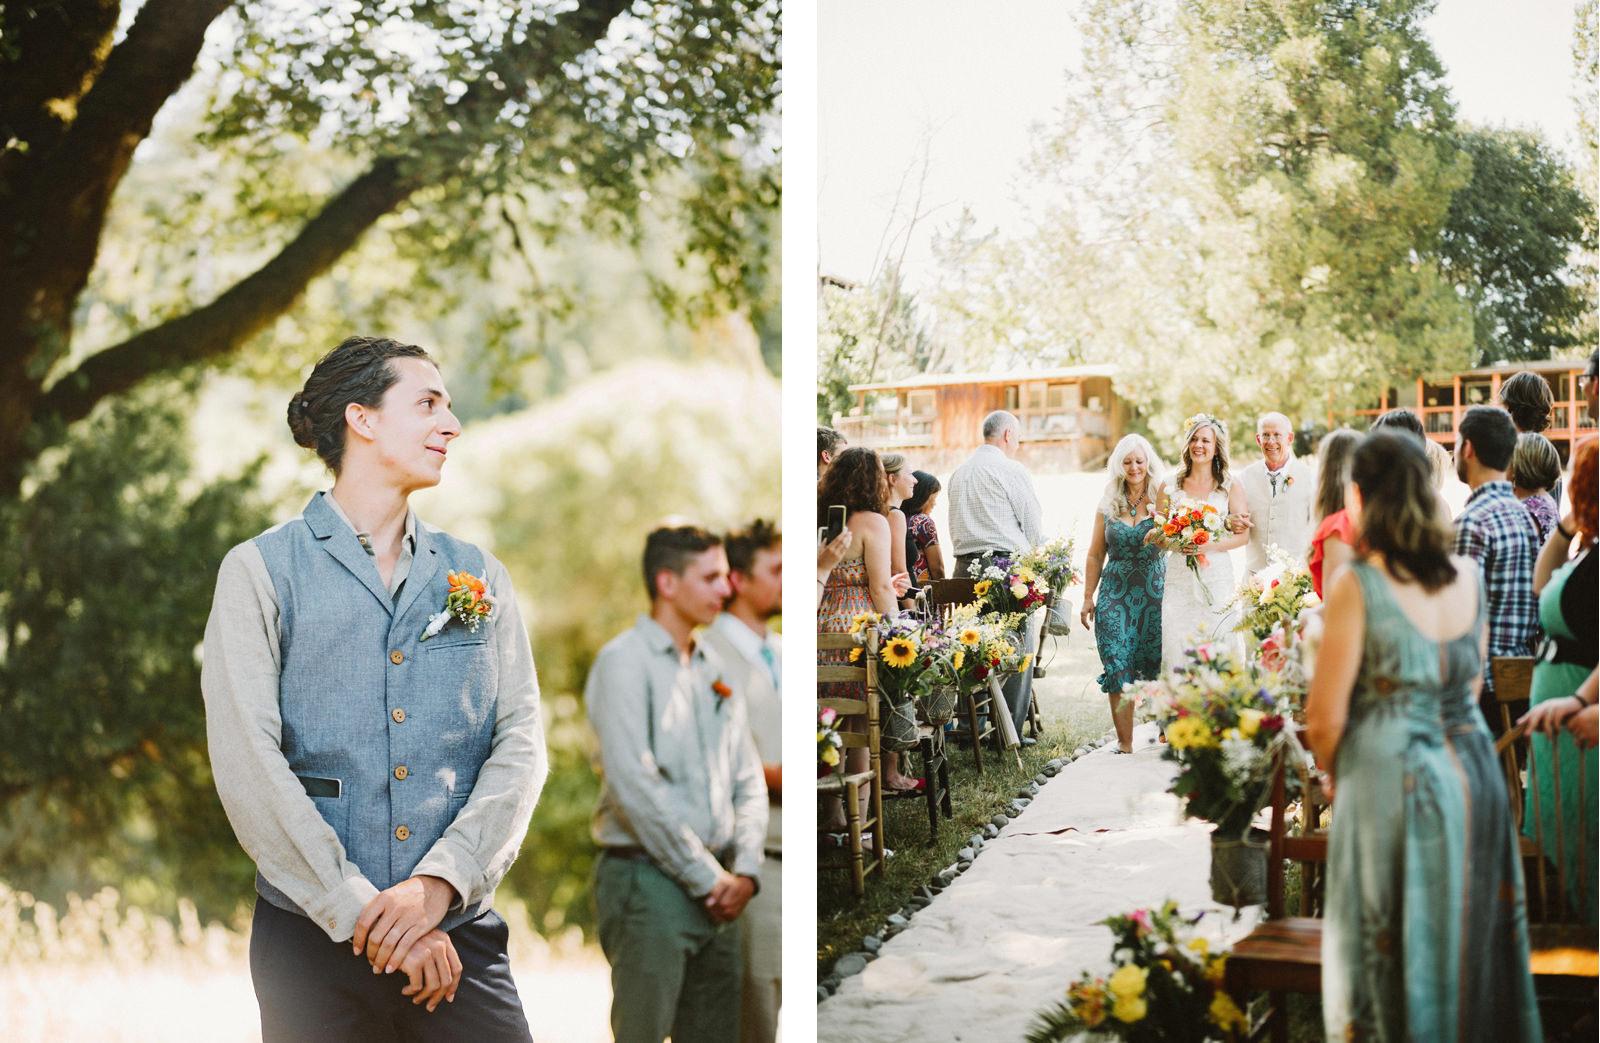 rivers-bend-retreat-wedding-018 RIVER'S BEND RETREAT WEDDING